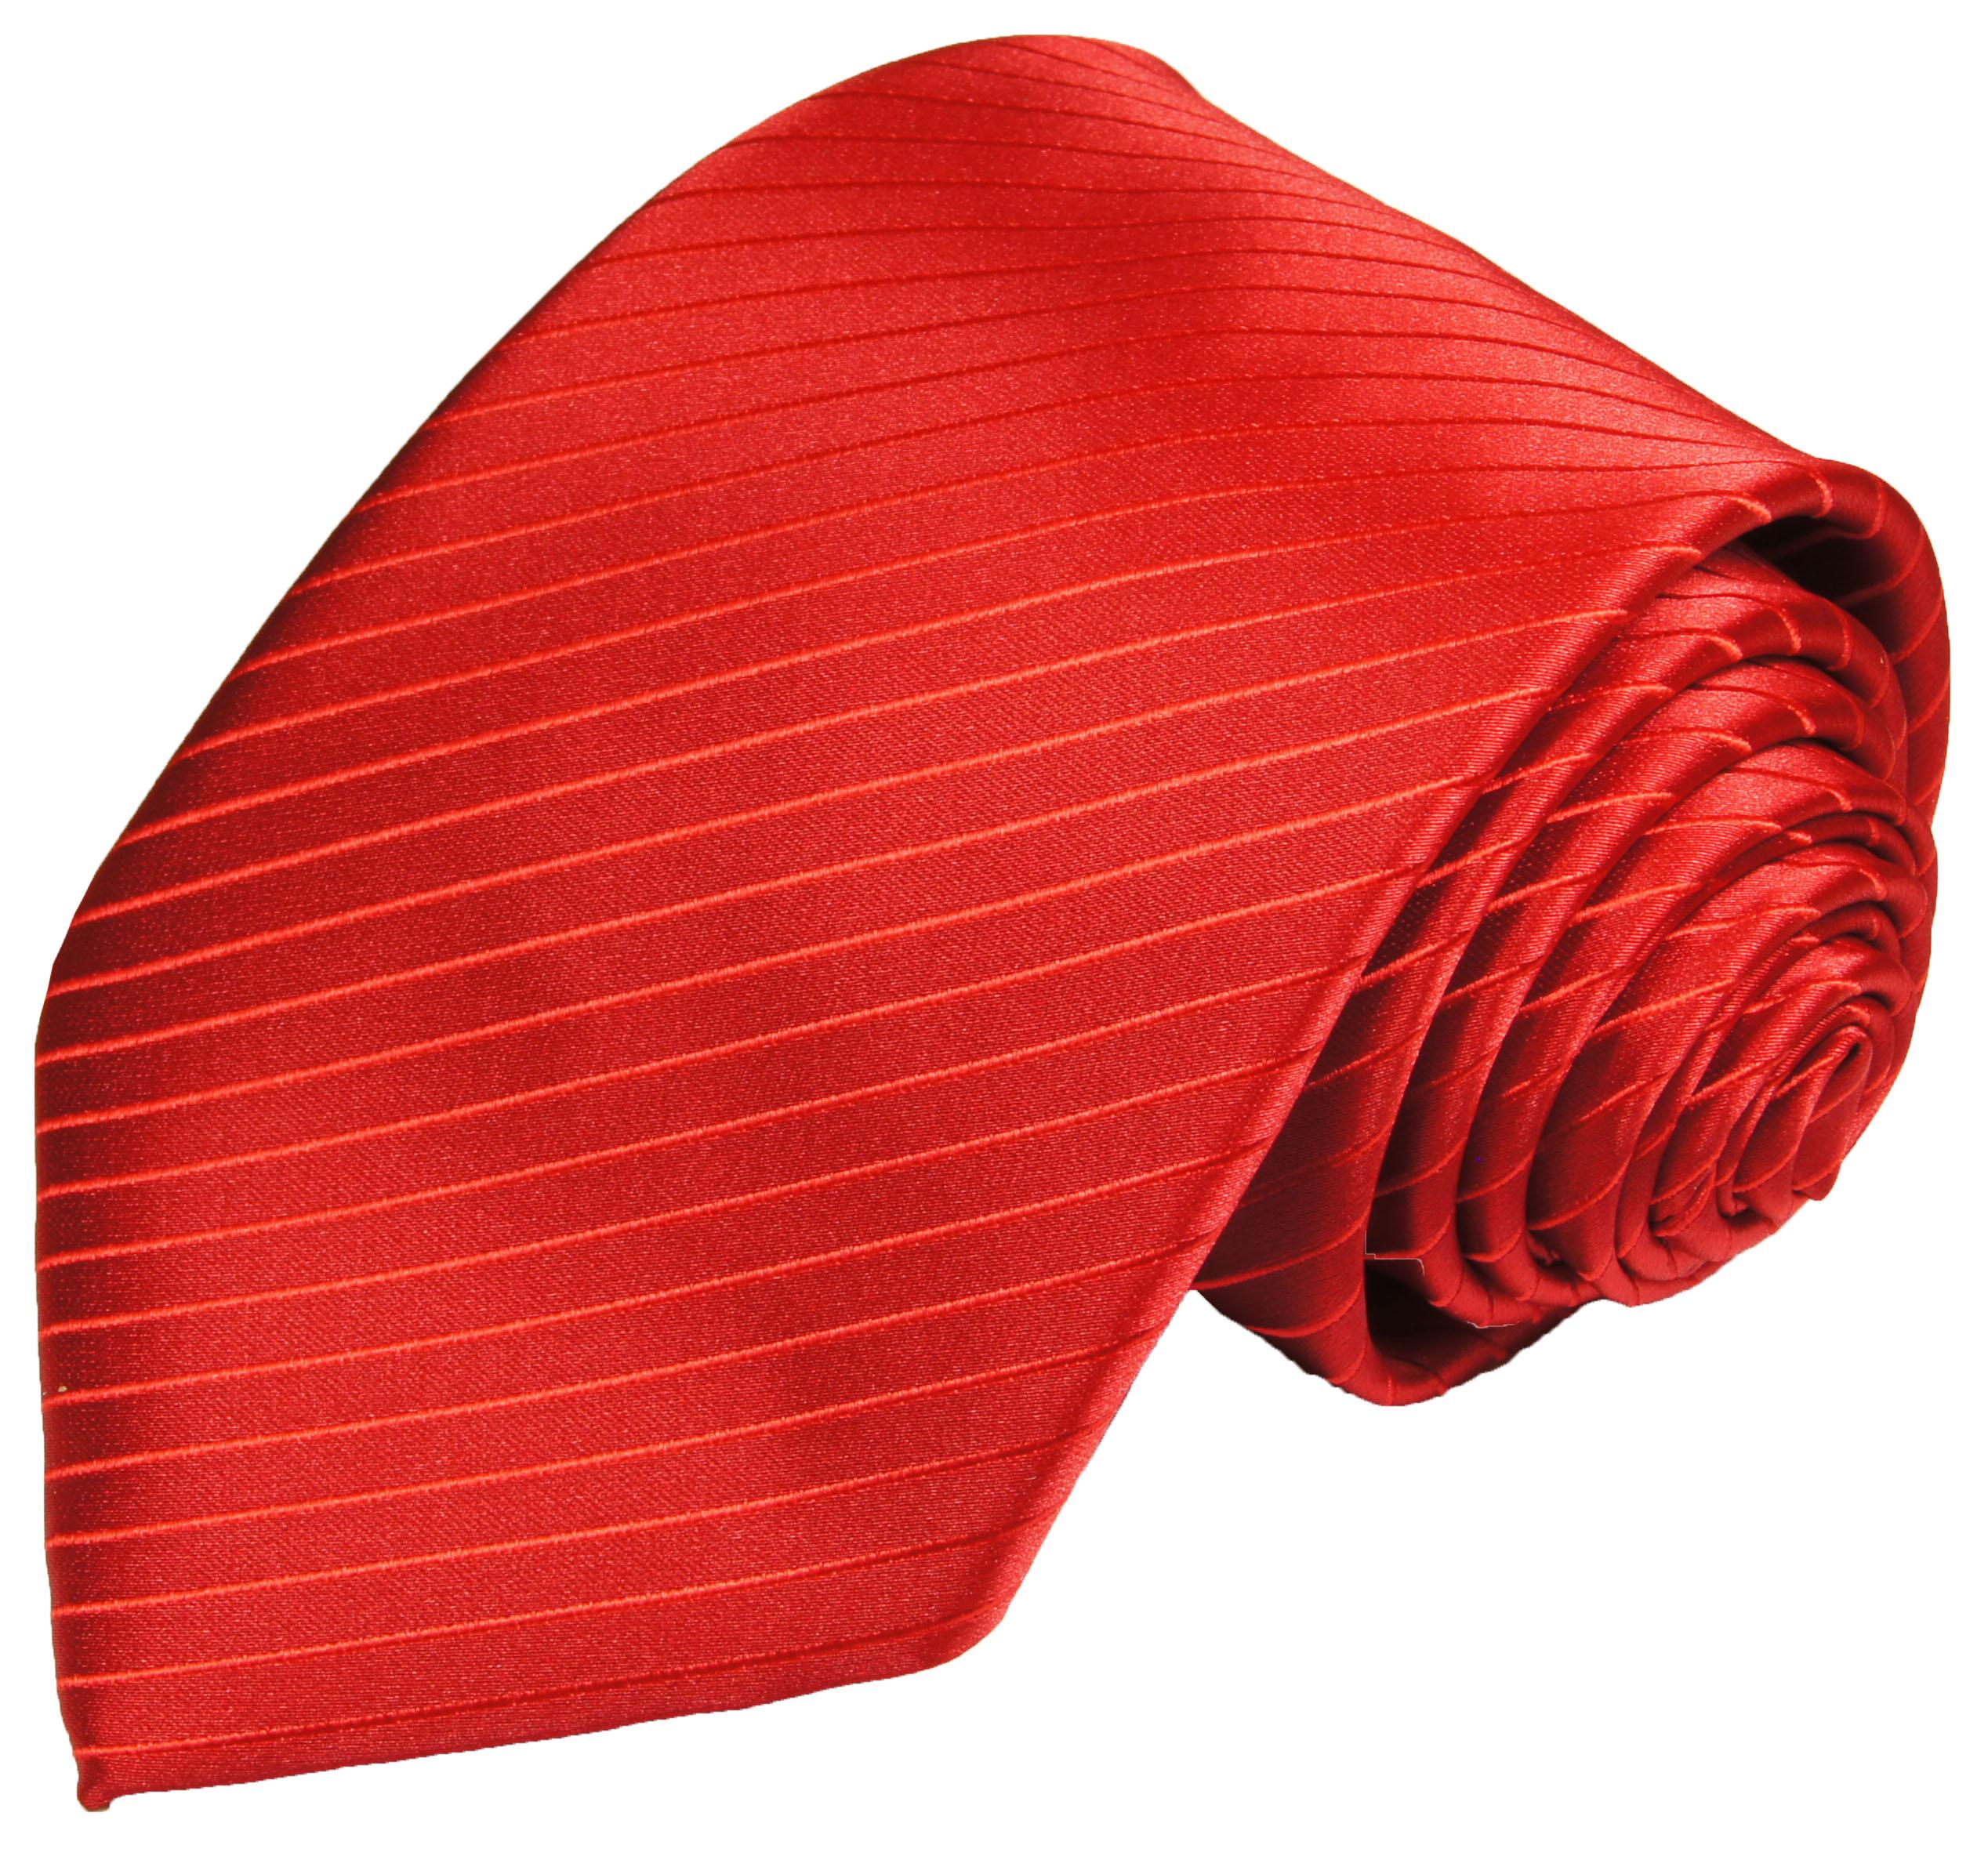 paul malone shop hochzeitswesten set 5tlg rot hemd. Black Bedroom Furniture Sets. Home Design Ideas